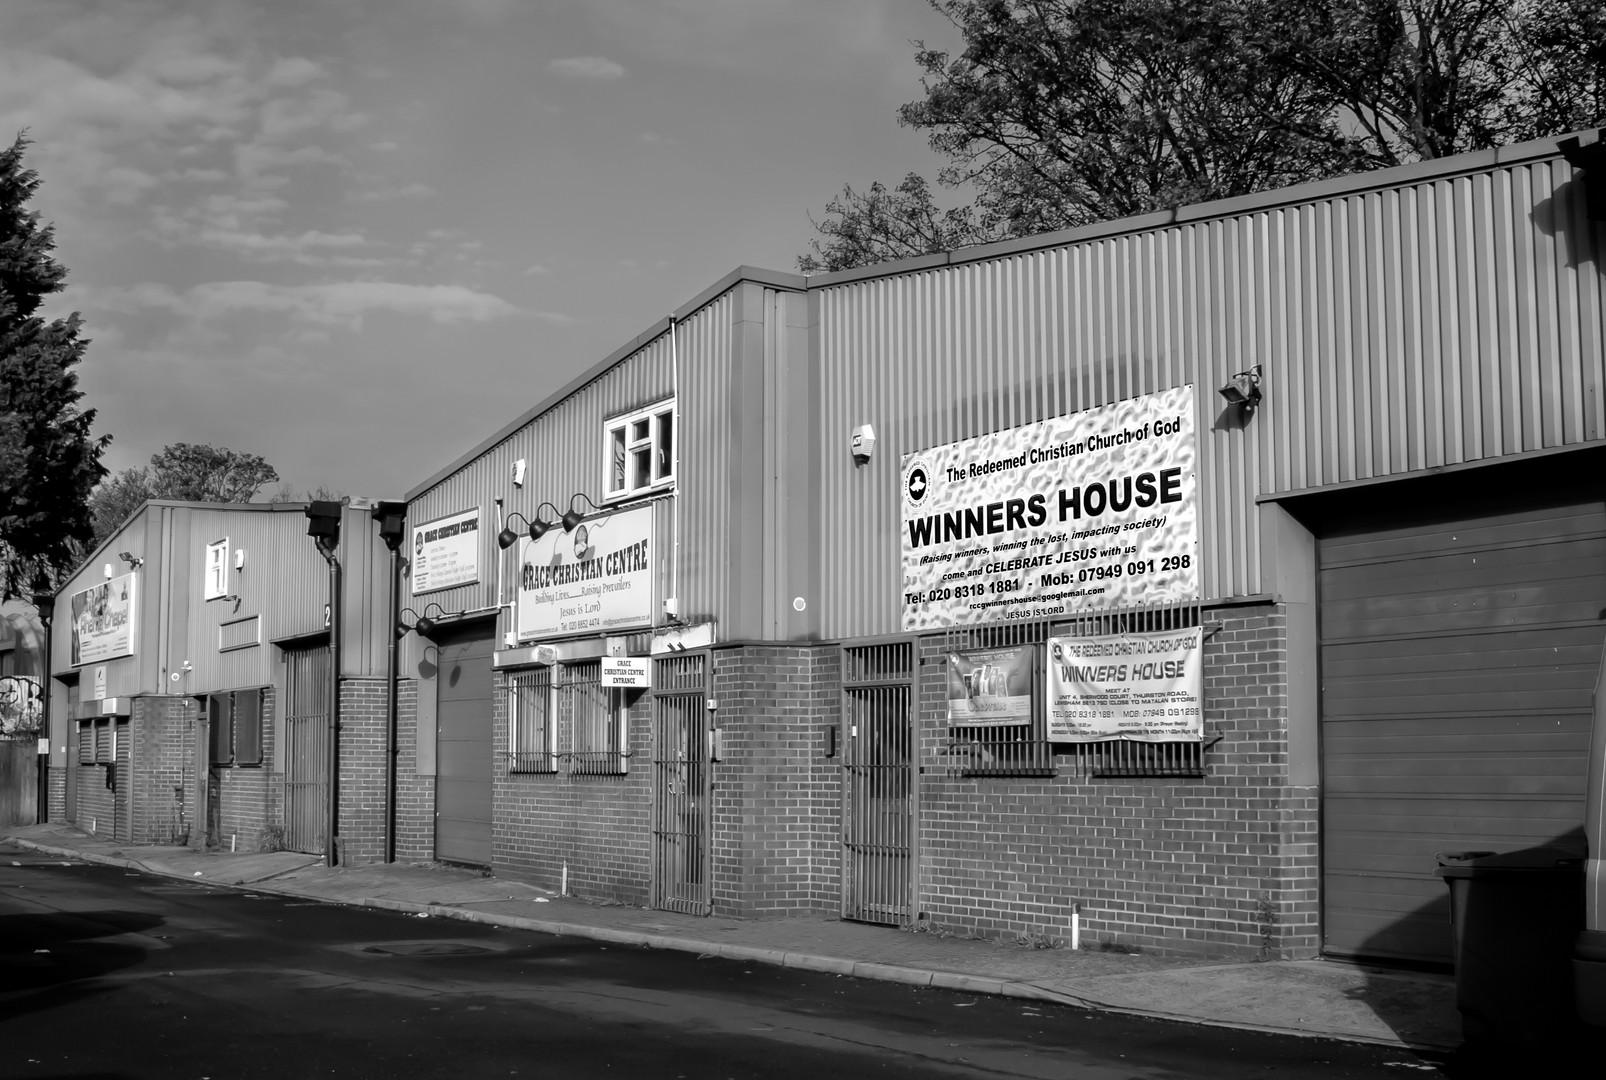 Winners House